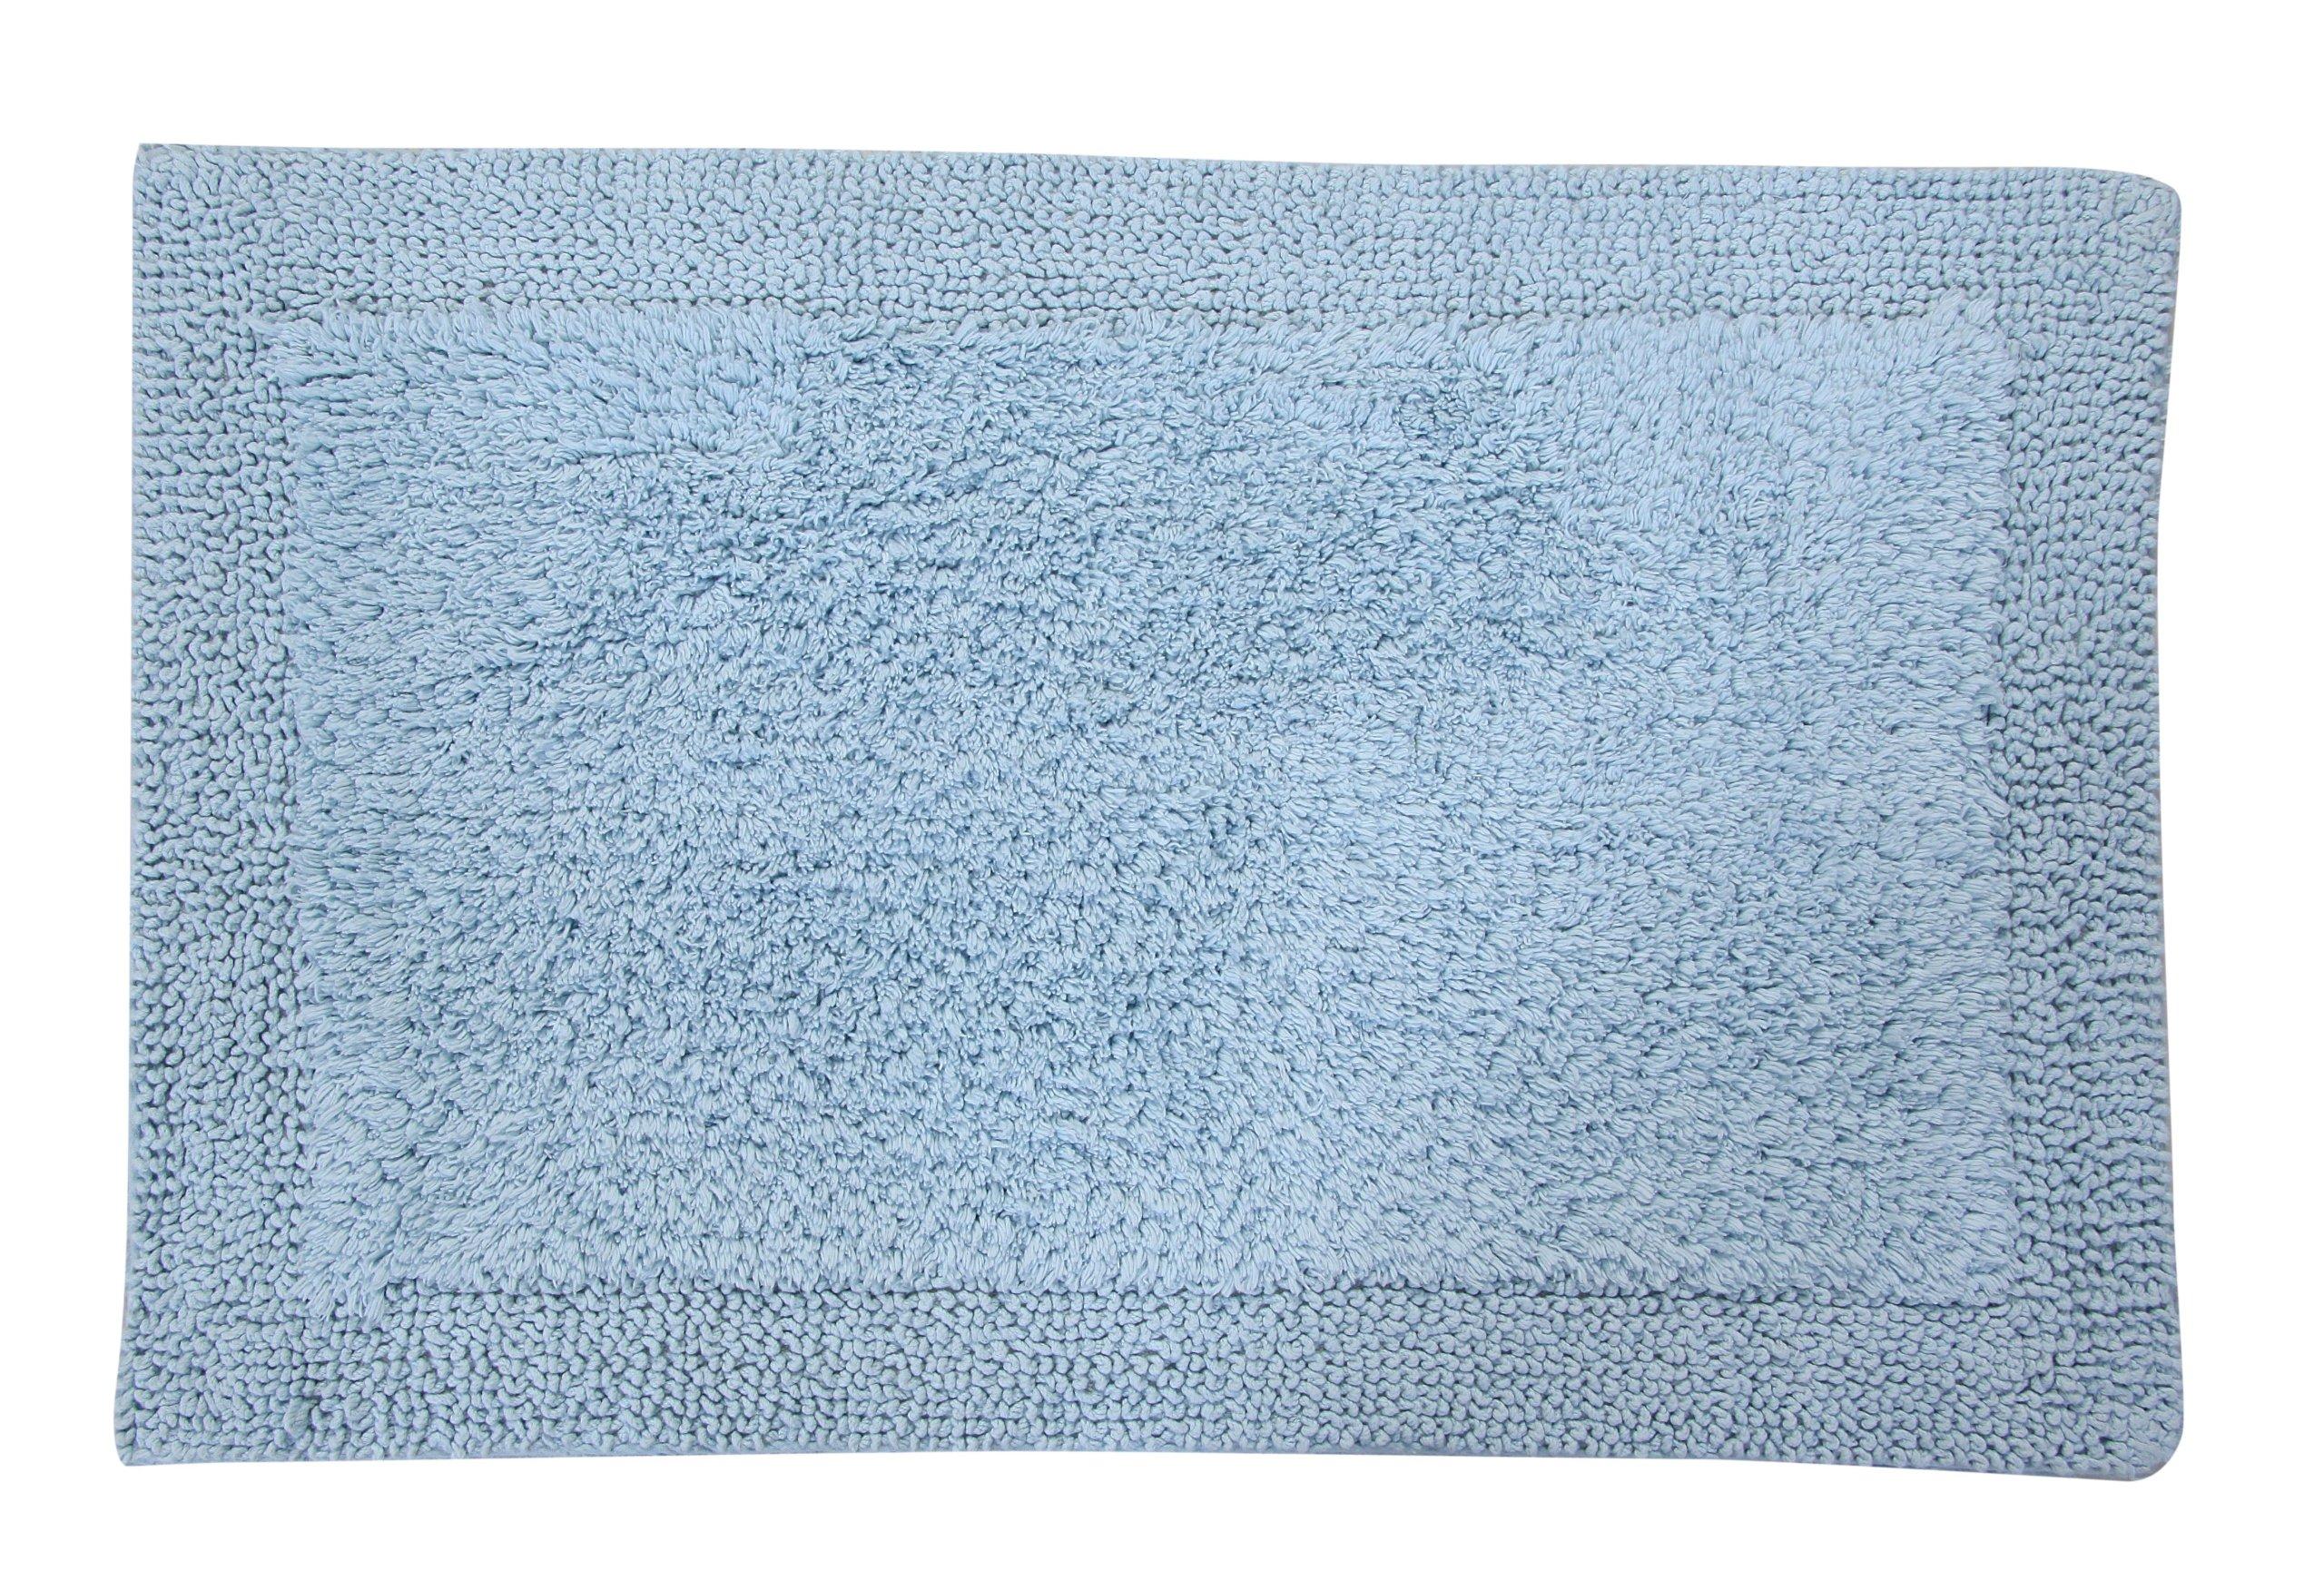 Castle Hill Bella Napoli 100% Cotton Reversible Bath Rug 20X30 Light Blue - Super soft absorbent bath rug Reversible bath mat Easy care machine washable - bathroom-linens, bathroom, bath-mats - A1DC2HnpDnL -